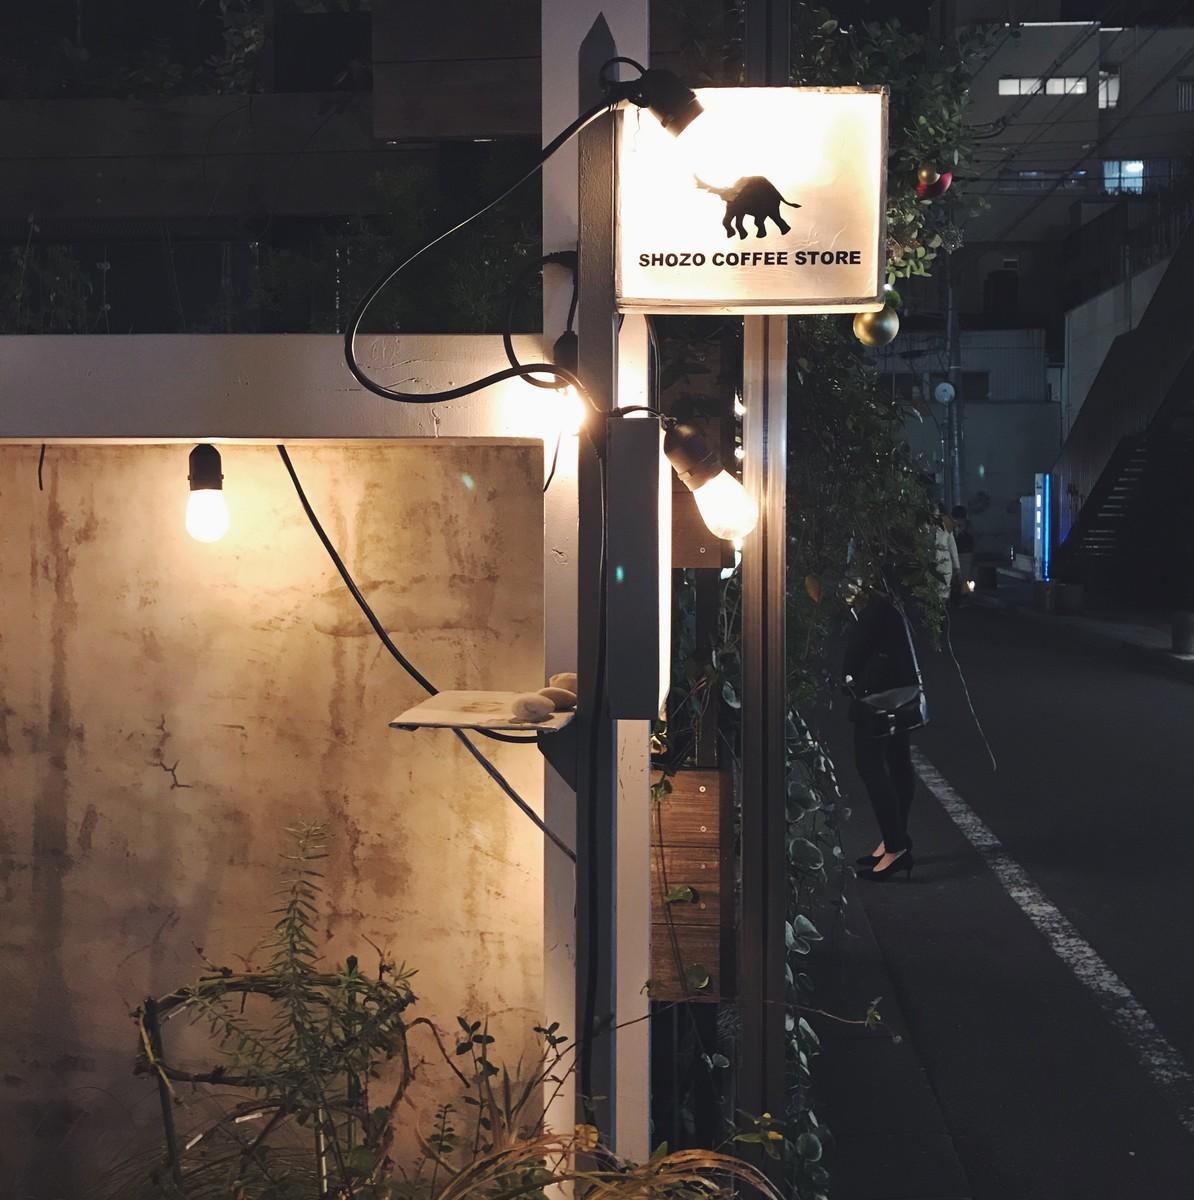 f:id:asacafe:20191211112202j:plain